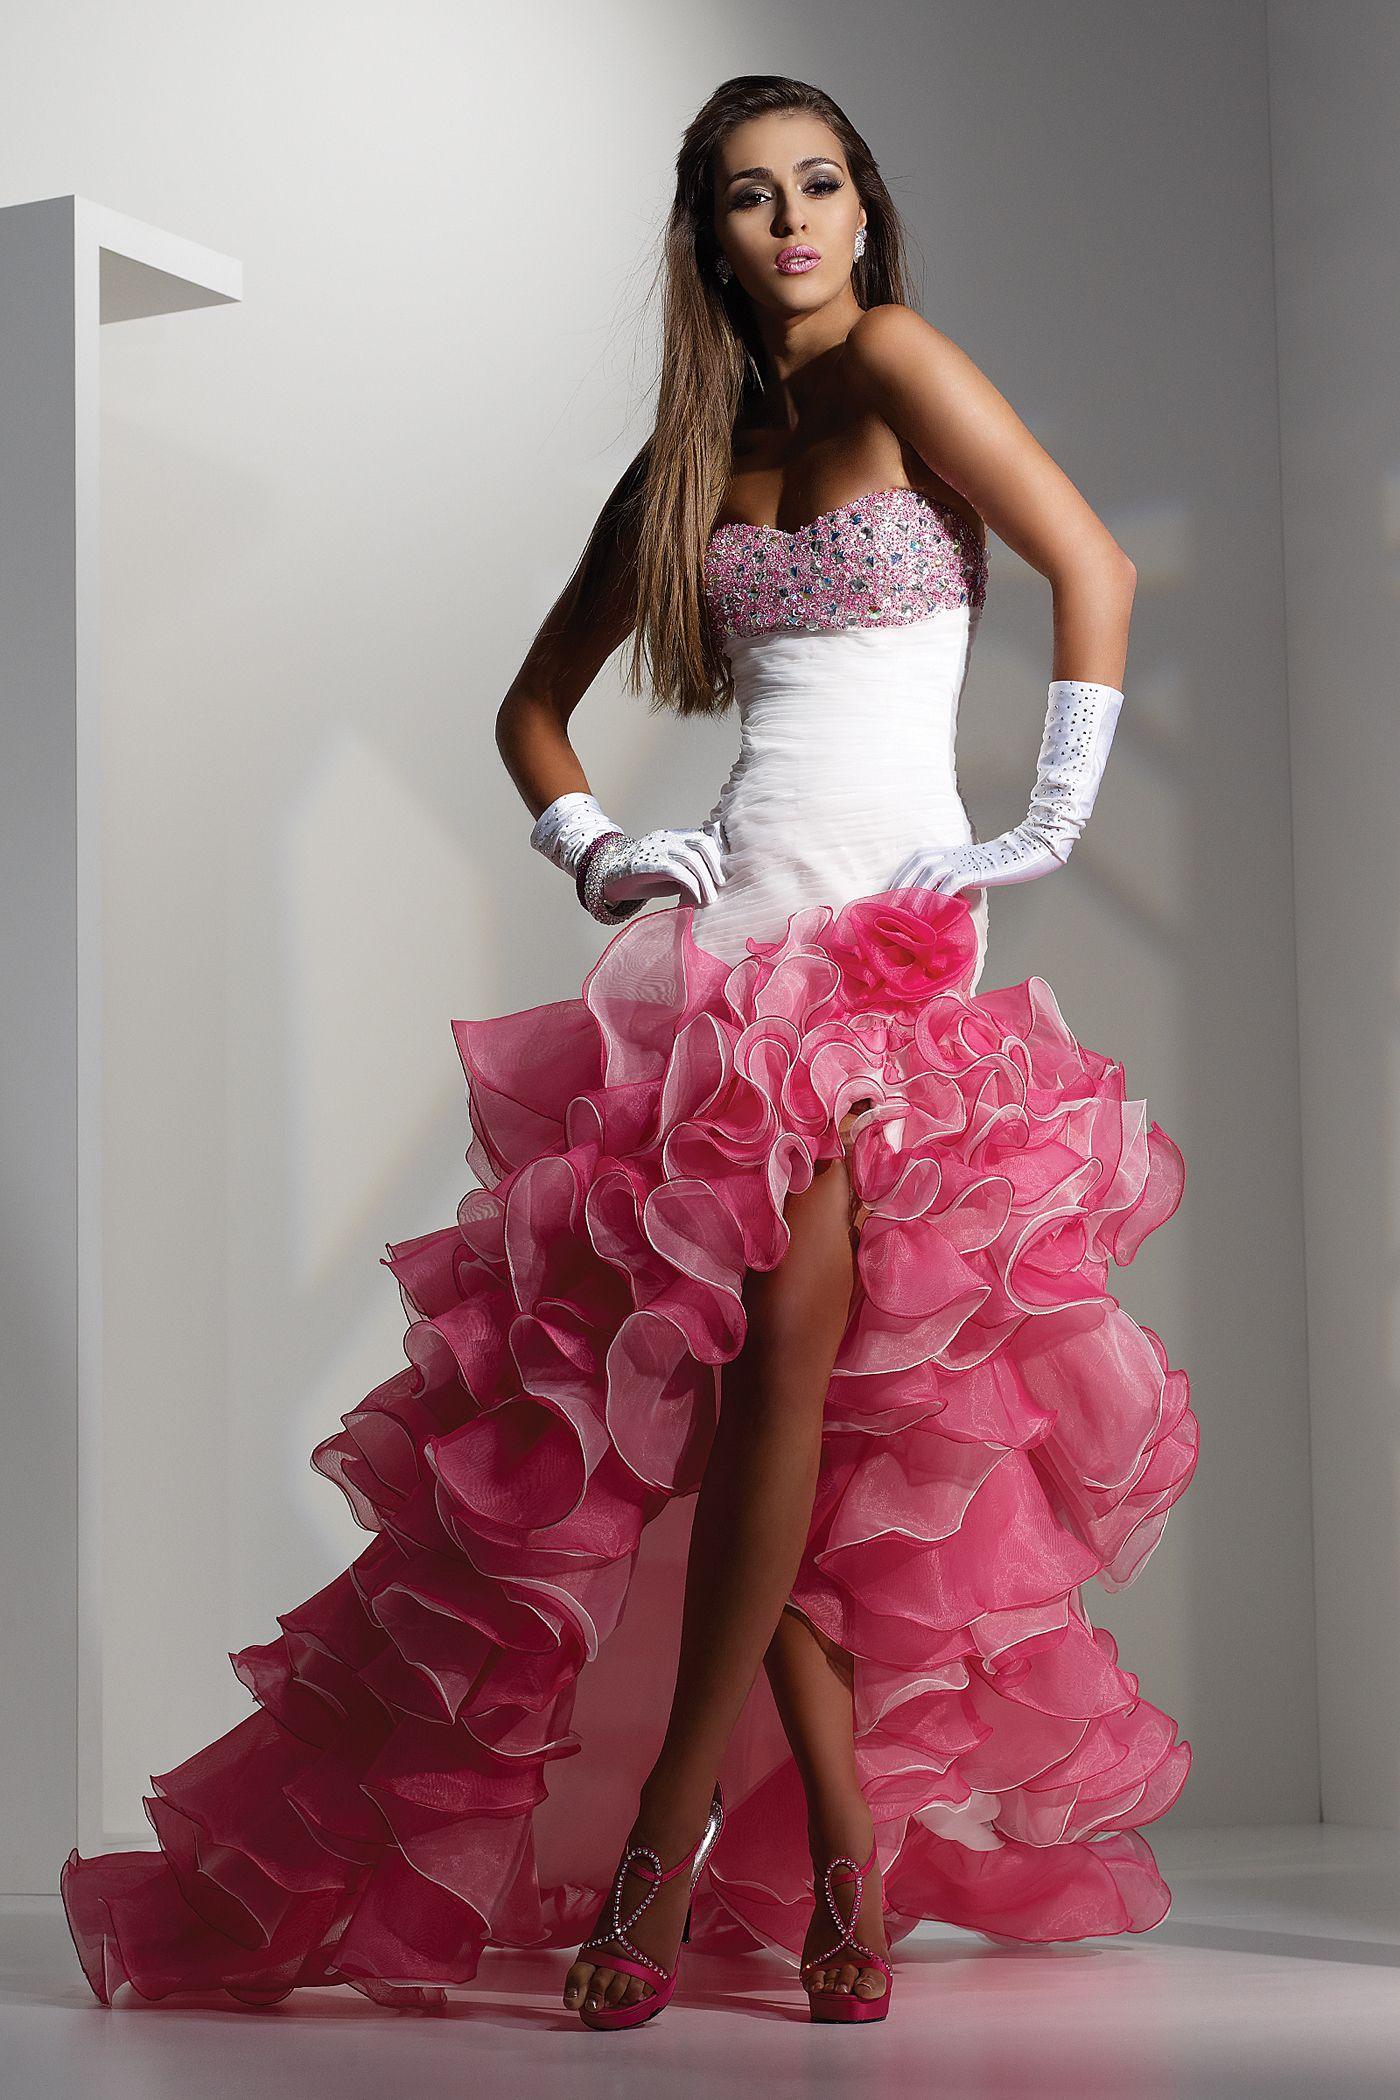 Glamorous Pink And White Wedding Dress